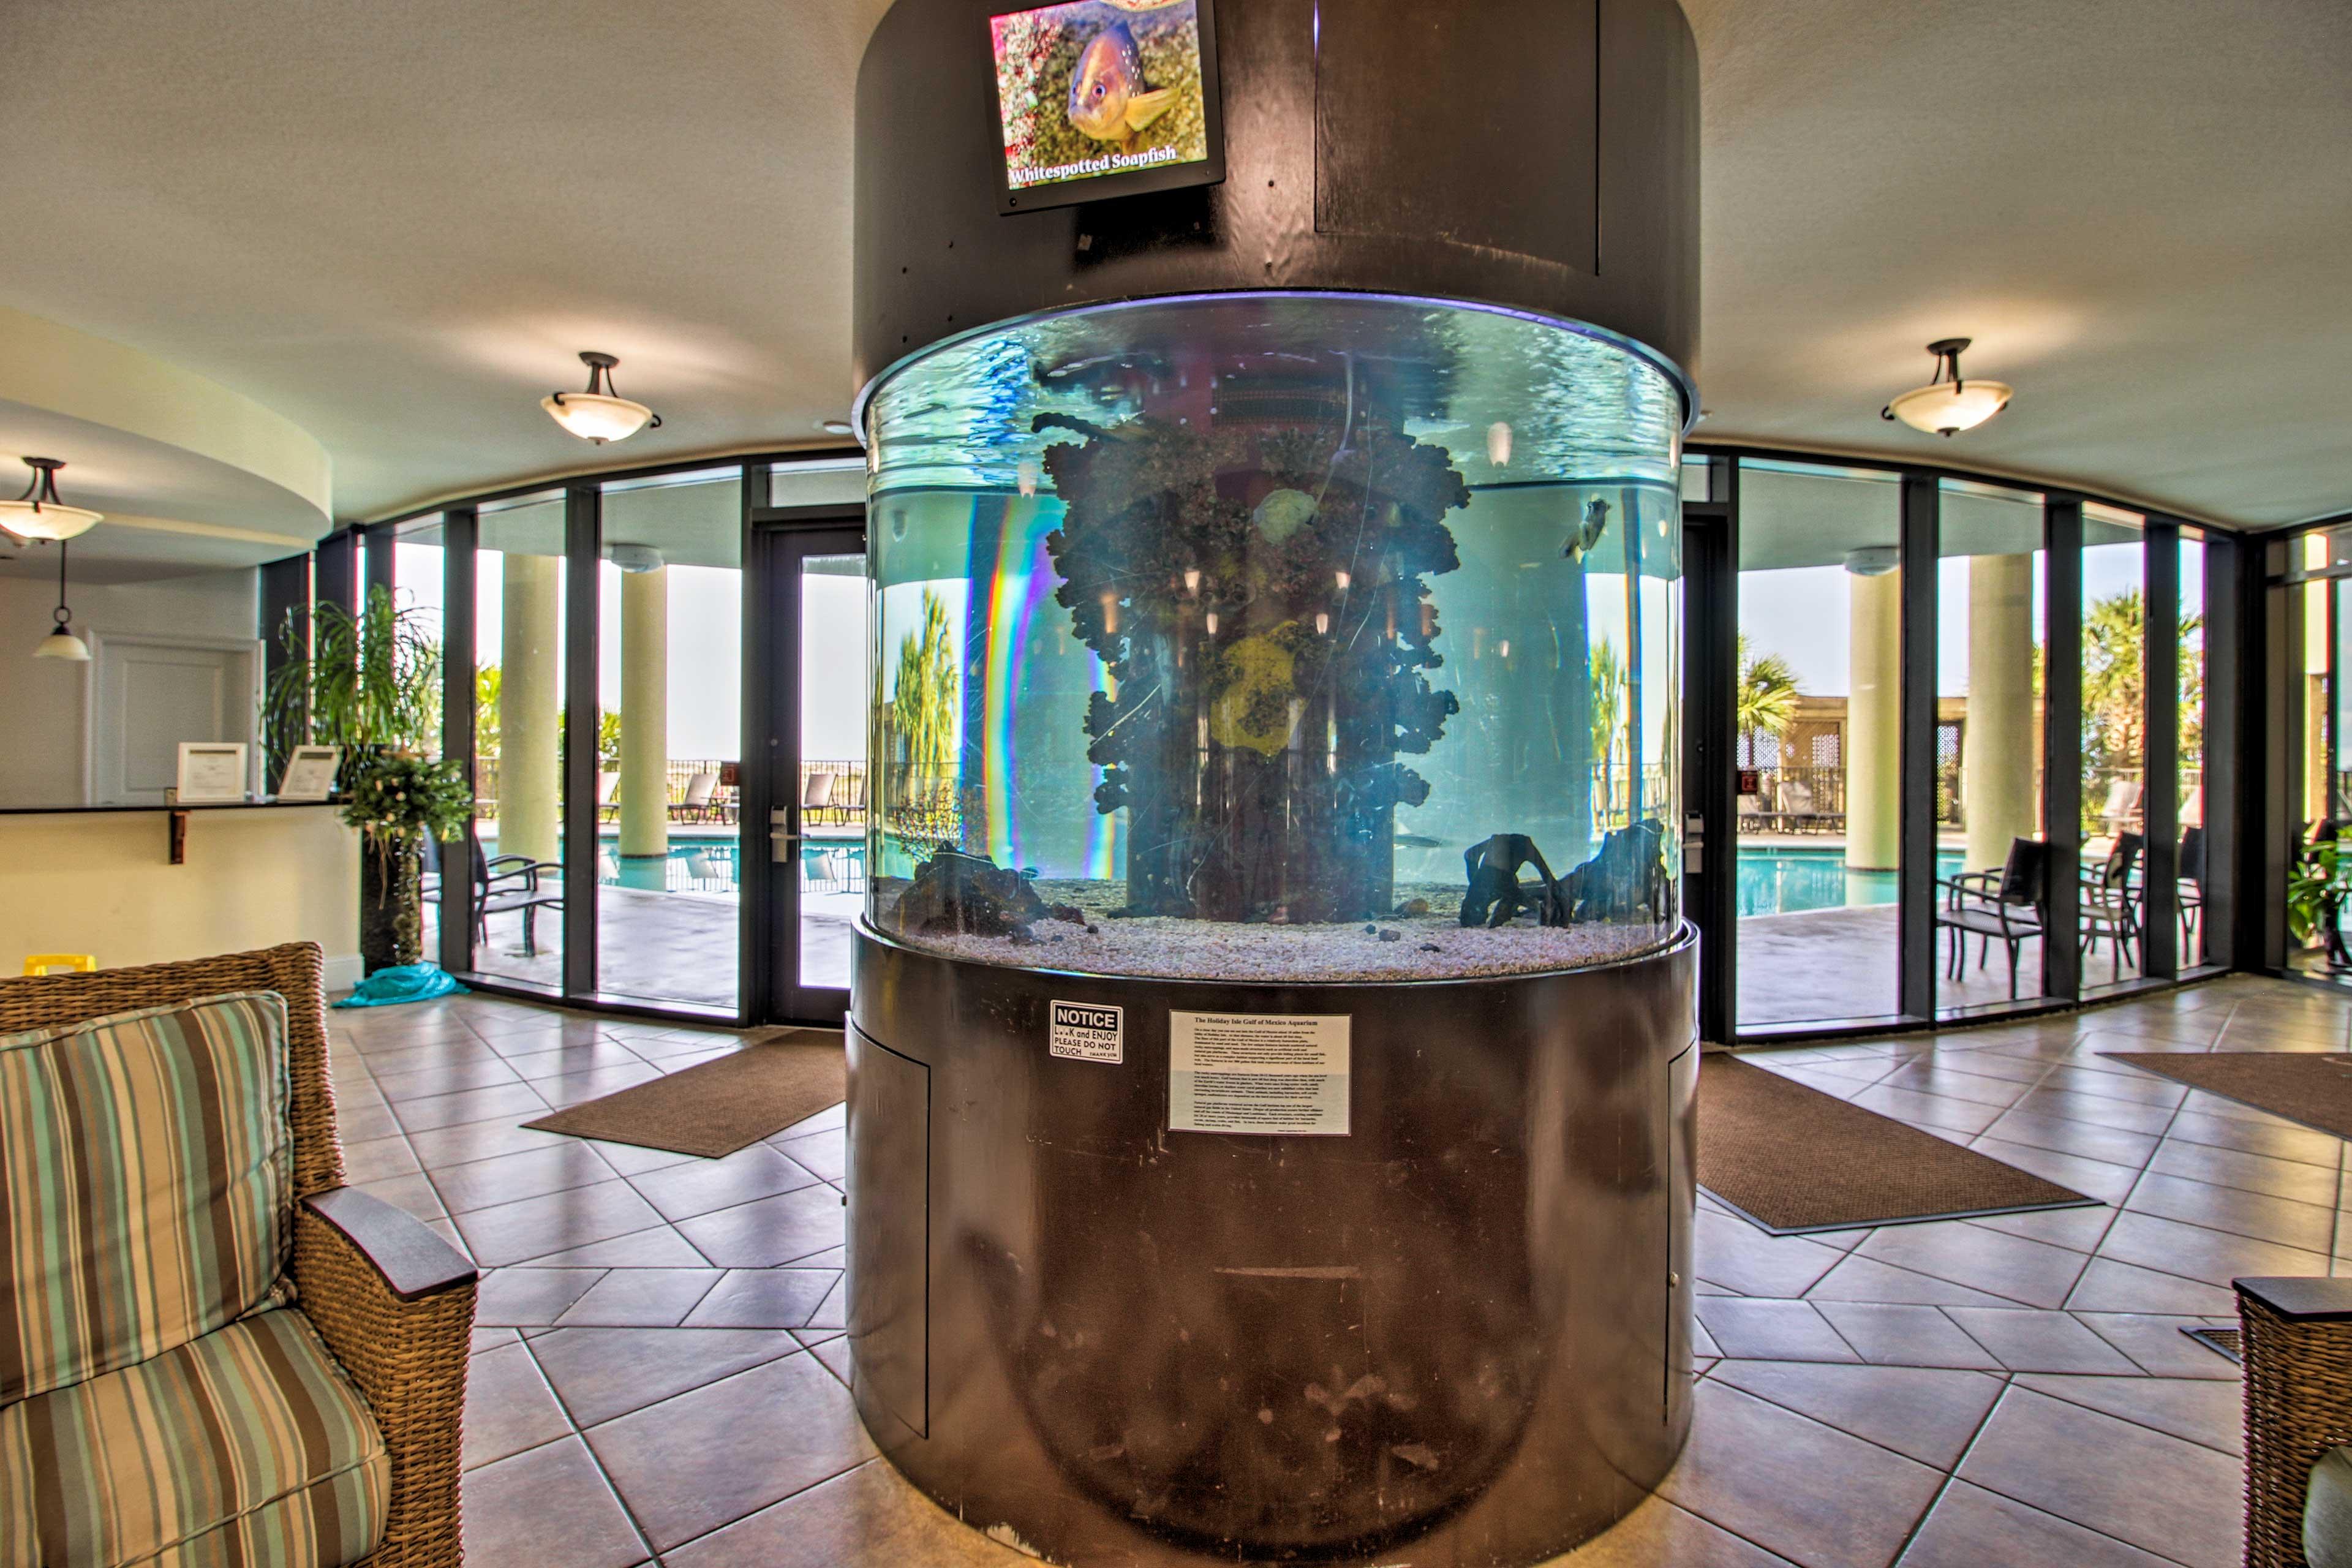 Holiday Isle Resort features fantastic indoor and outdoor amenities.